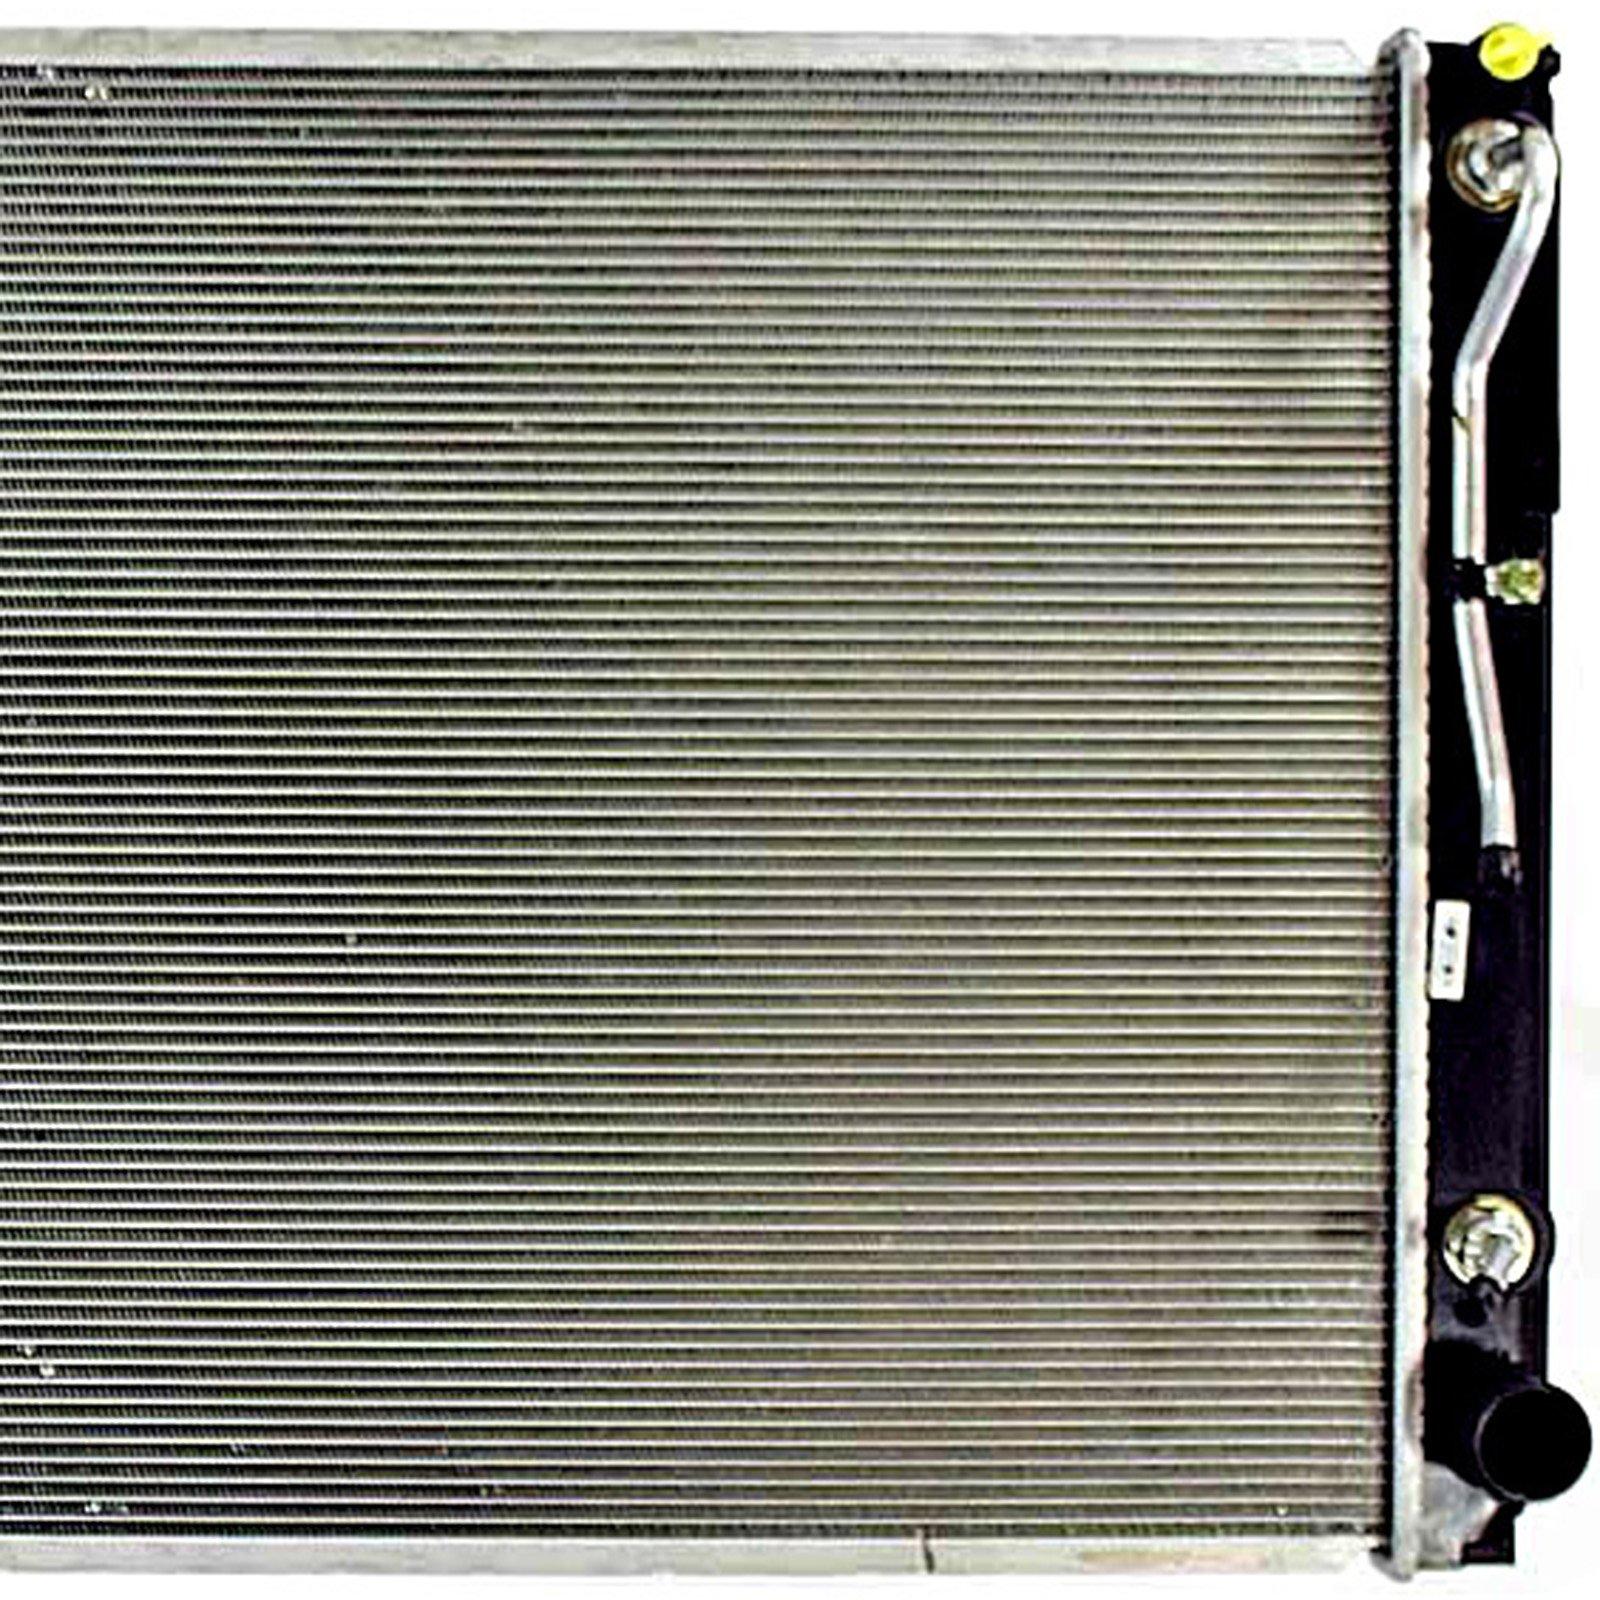 ECCPP Radiator 13019 for 2007-2009 Lexus RX350 Base Sport Utility 4-Door 3.5L